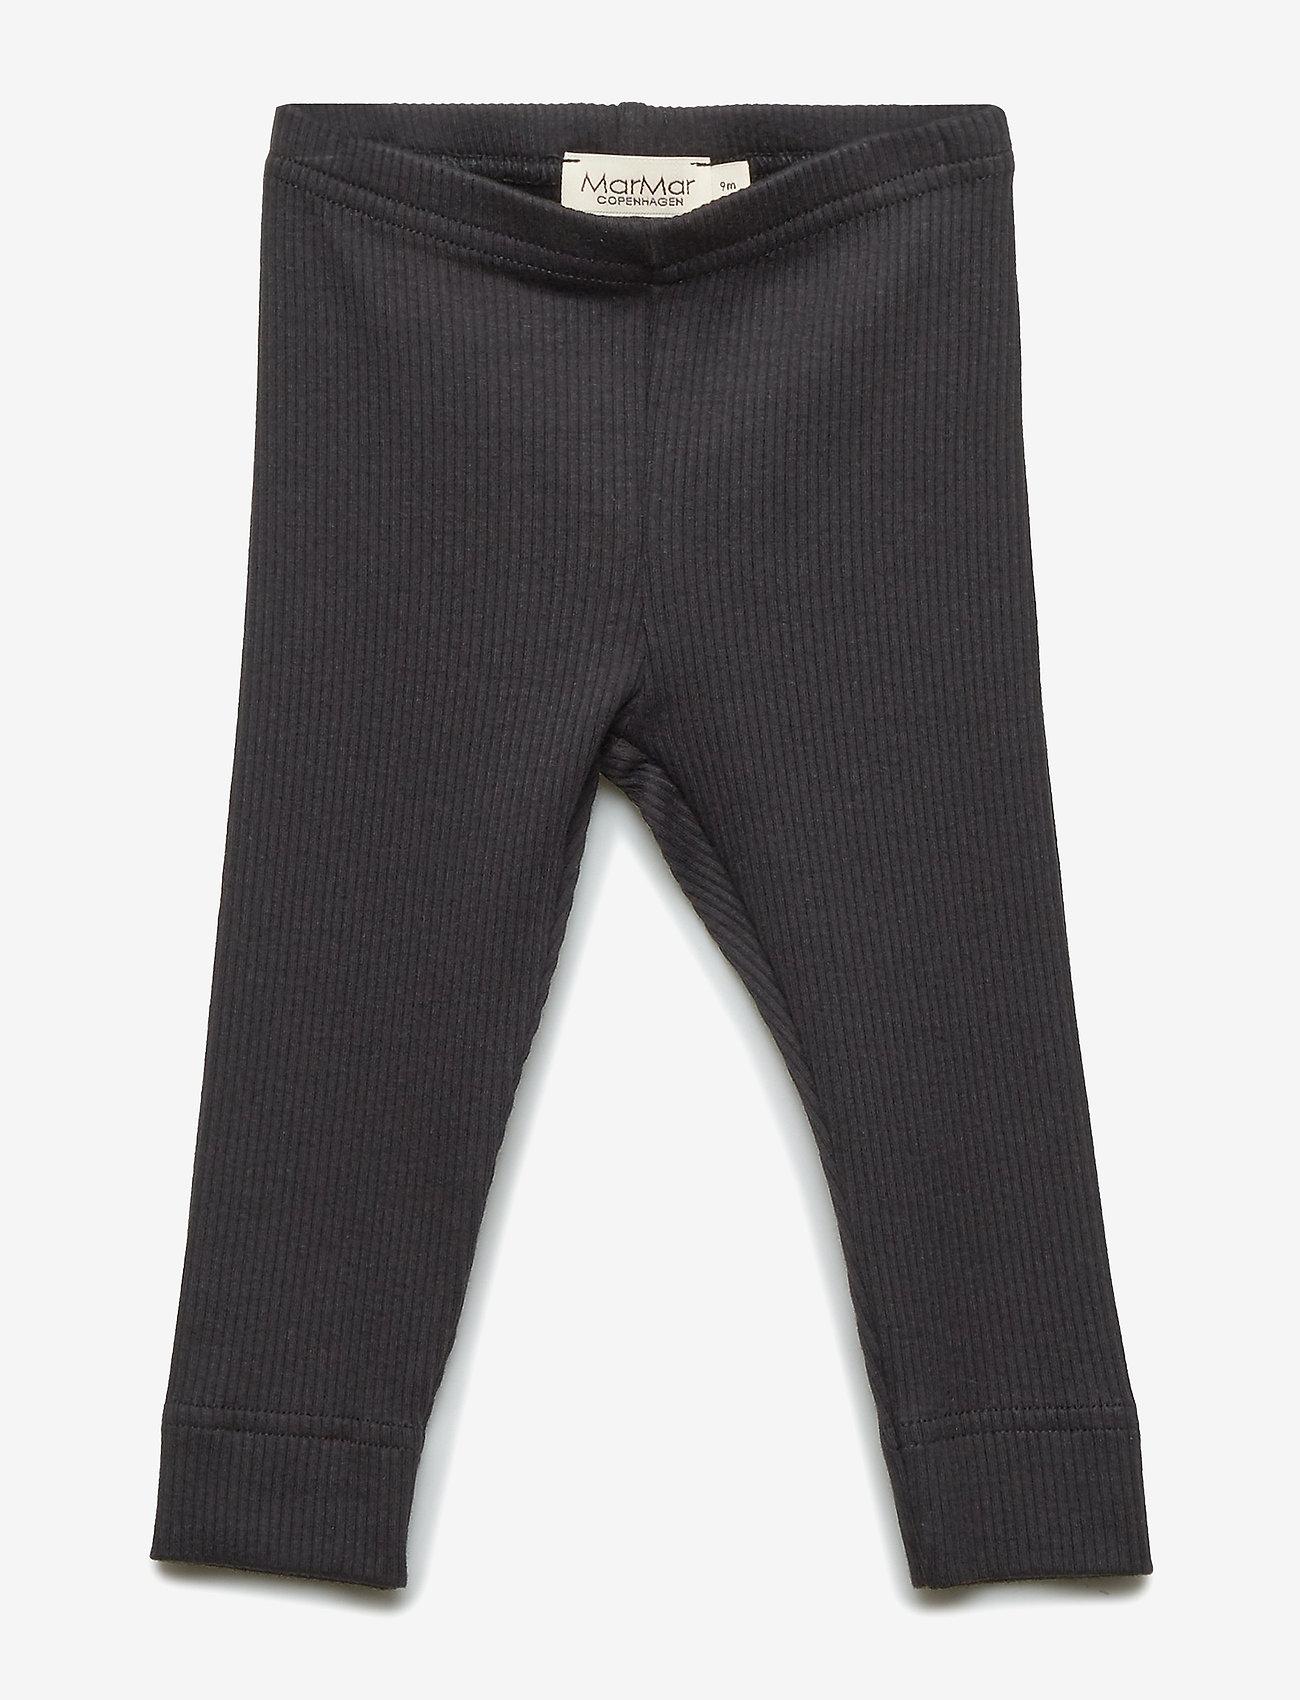 MarMar Cph - Leg - leggings - black - 0